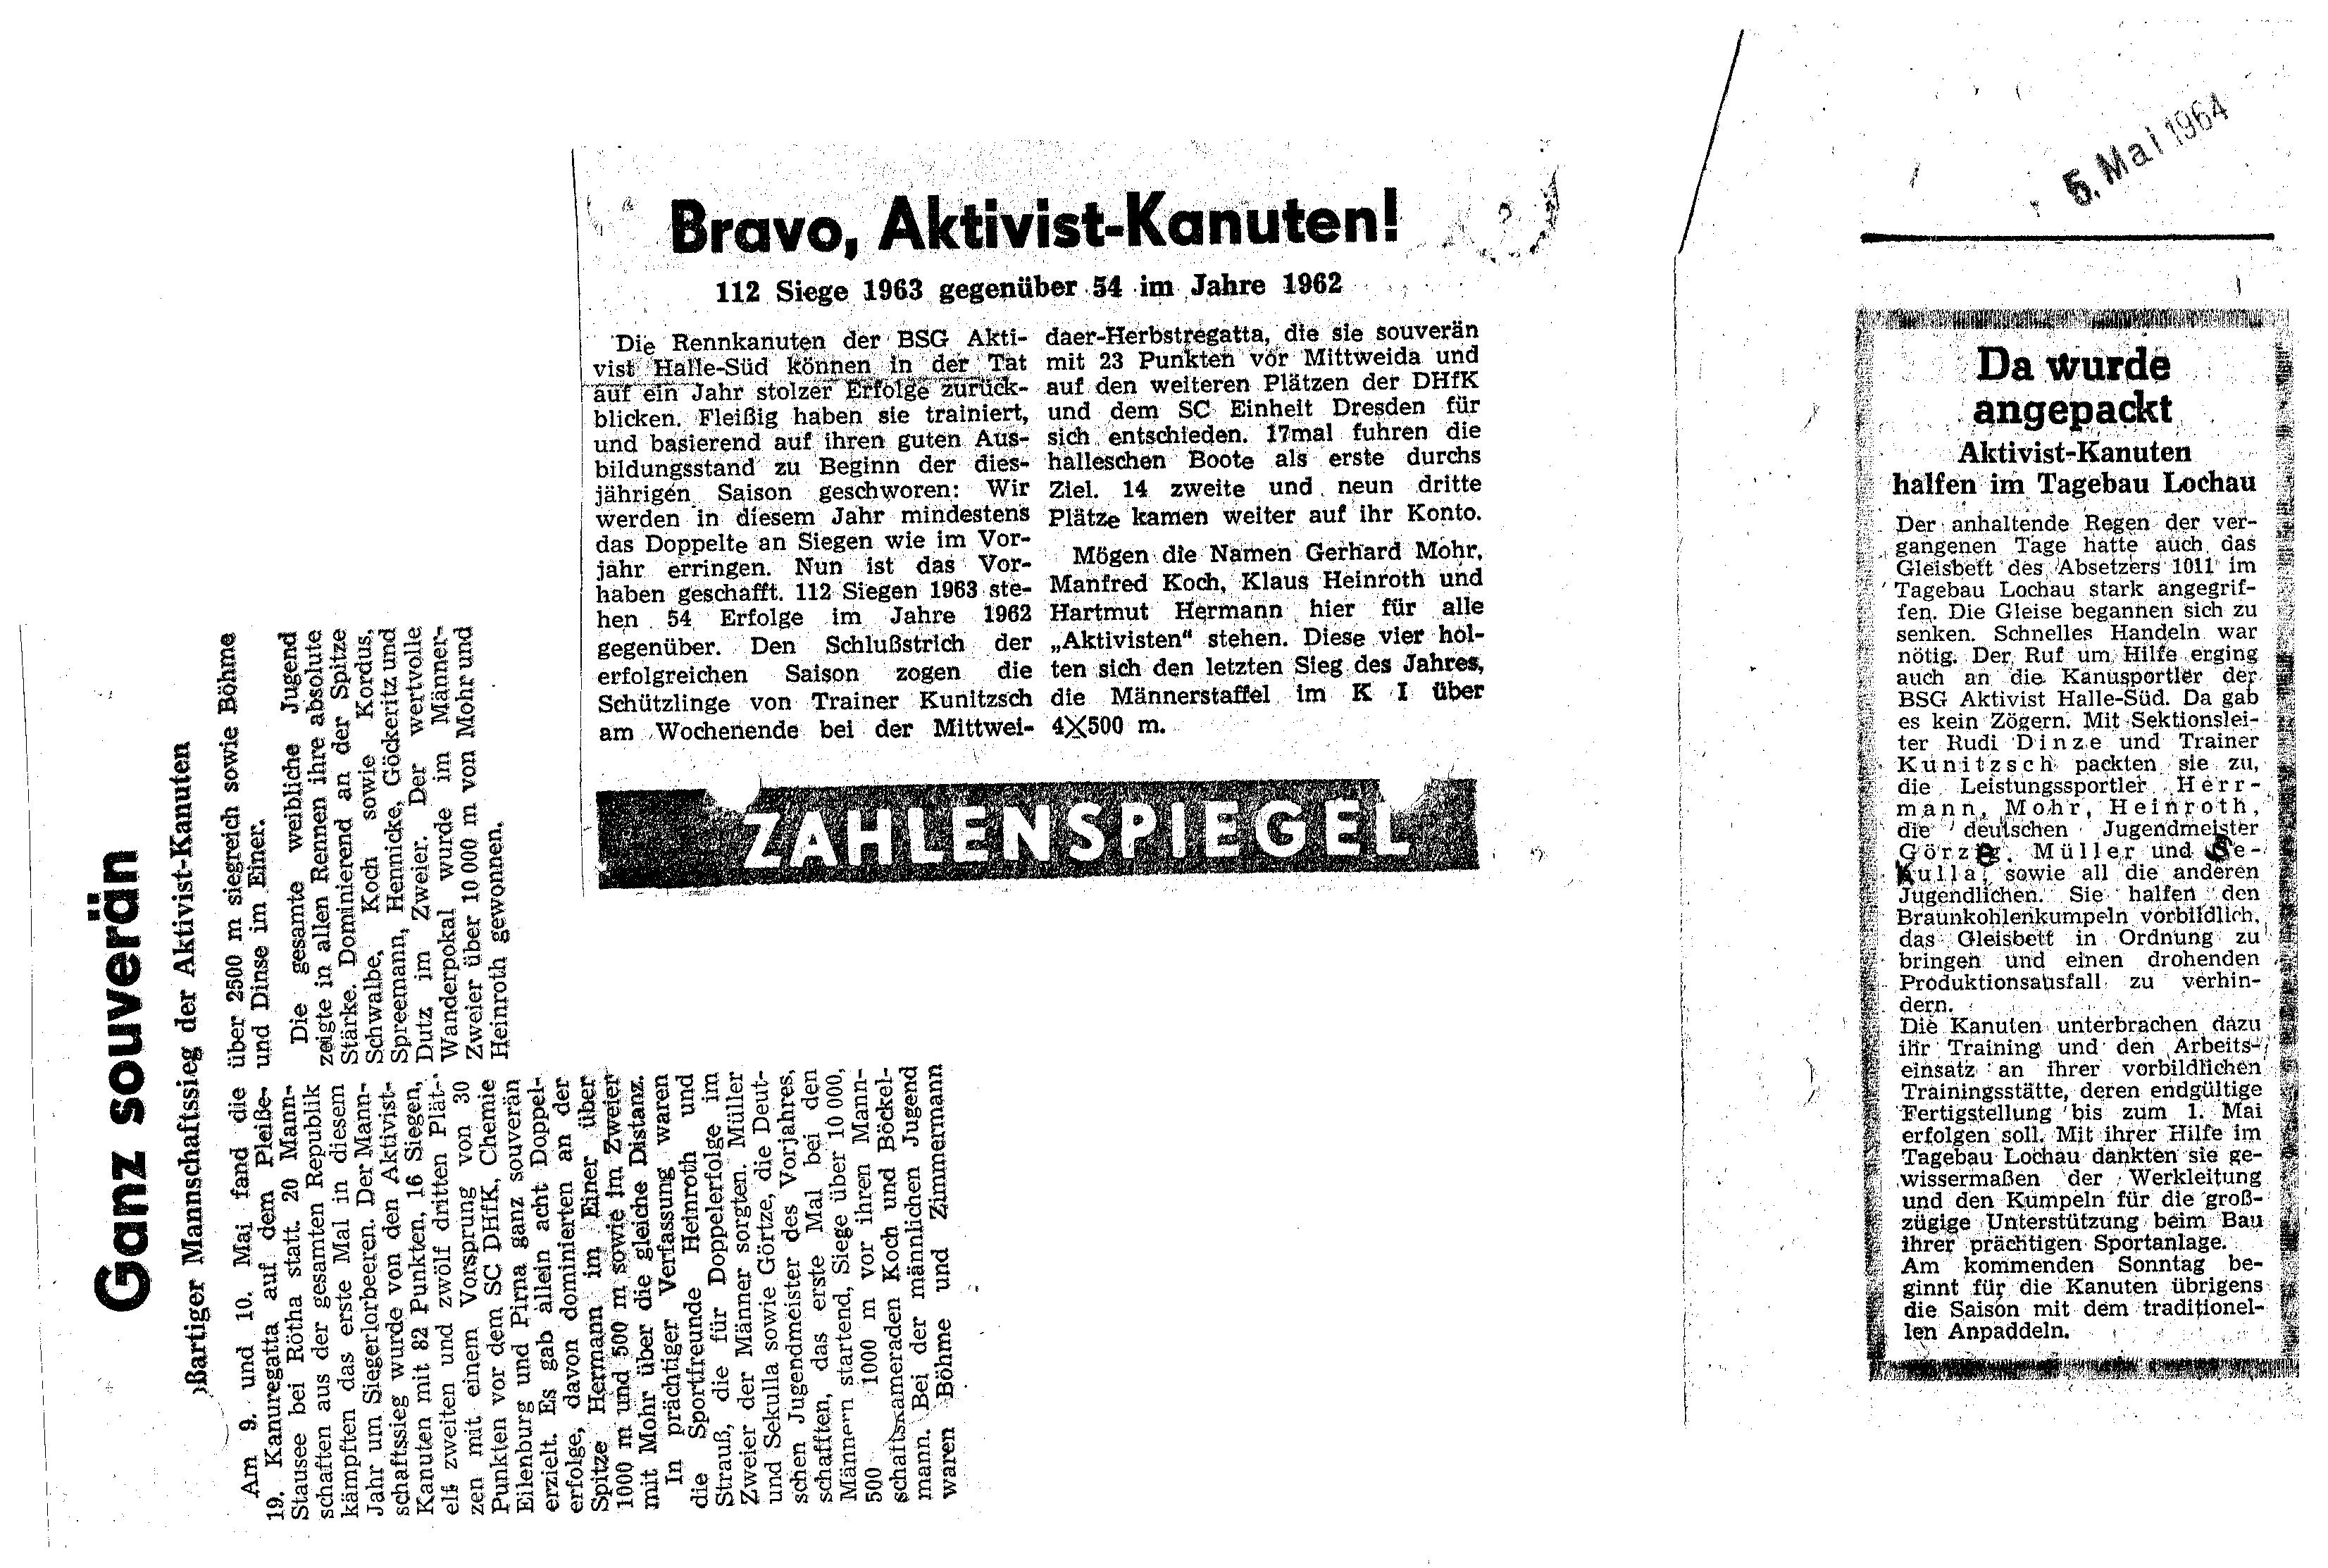 1964-05-05 Bravo Aktivist-Kanuten